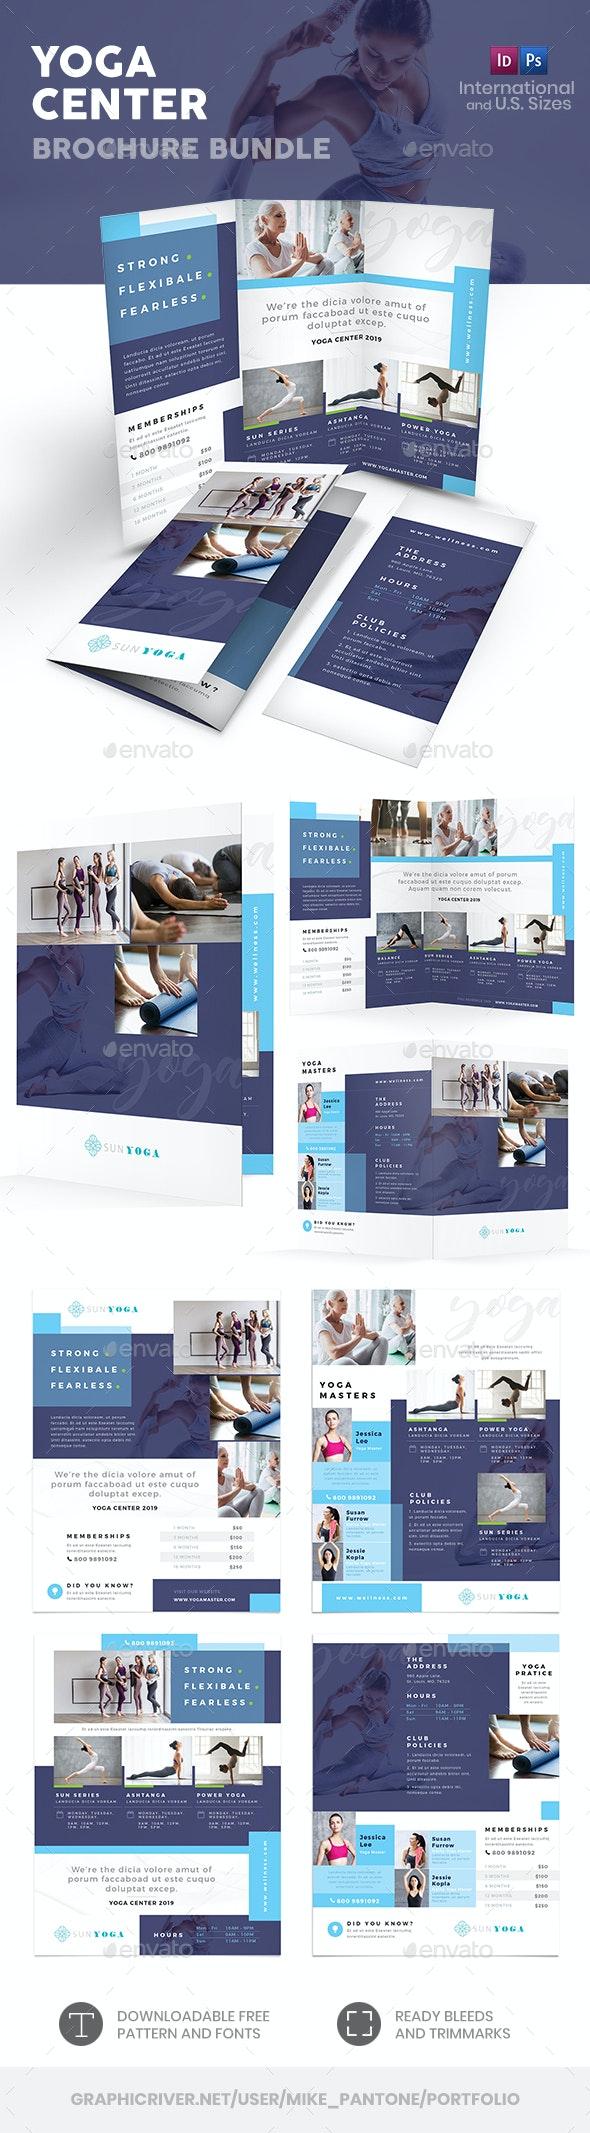 Yoga Center Print Bundle 4 - Informational Brochures